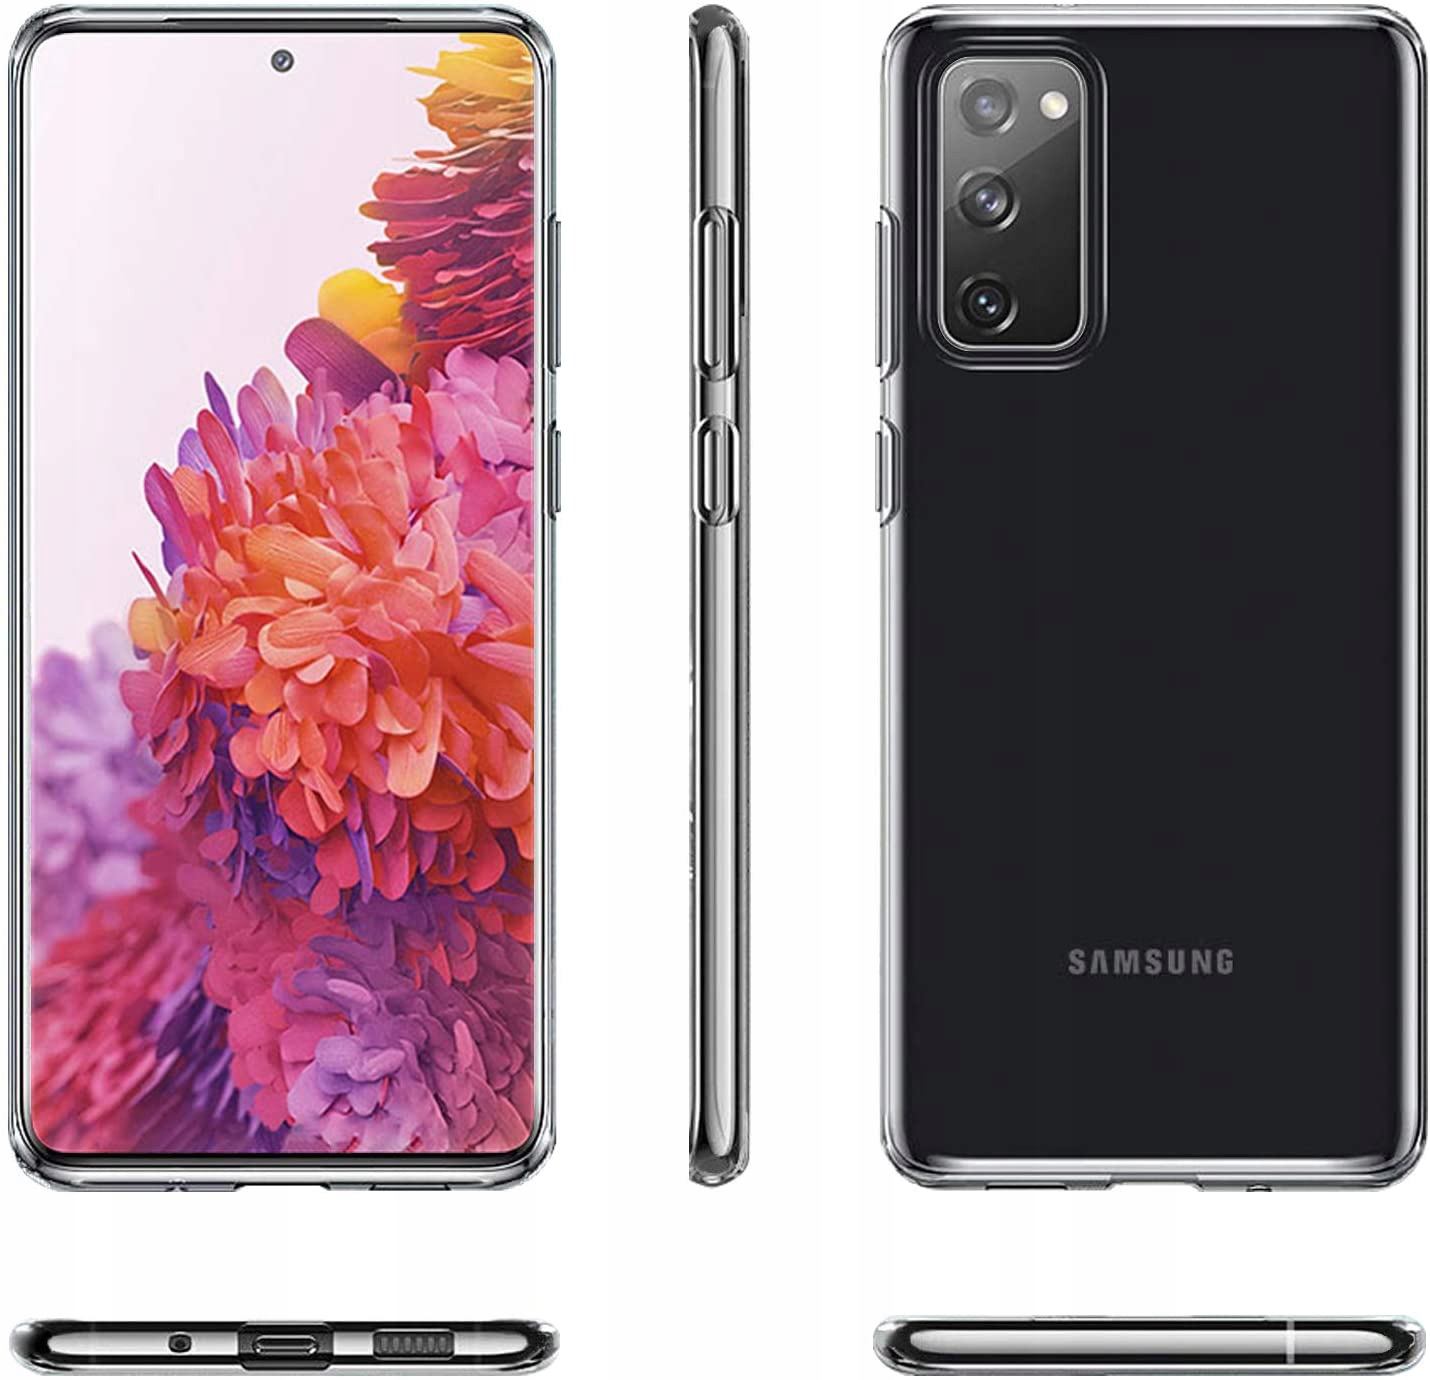 Etui do Samsung Galaxy S20 FE Clear Case + Szkło Dedykowany model Samsung Galaxy S20 FE